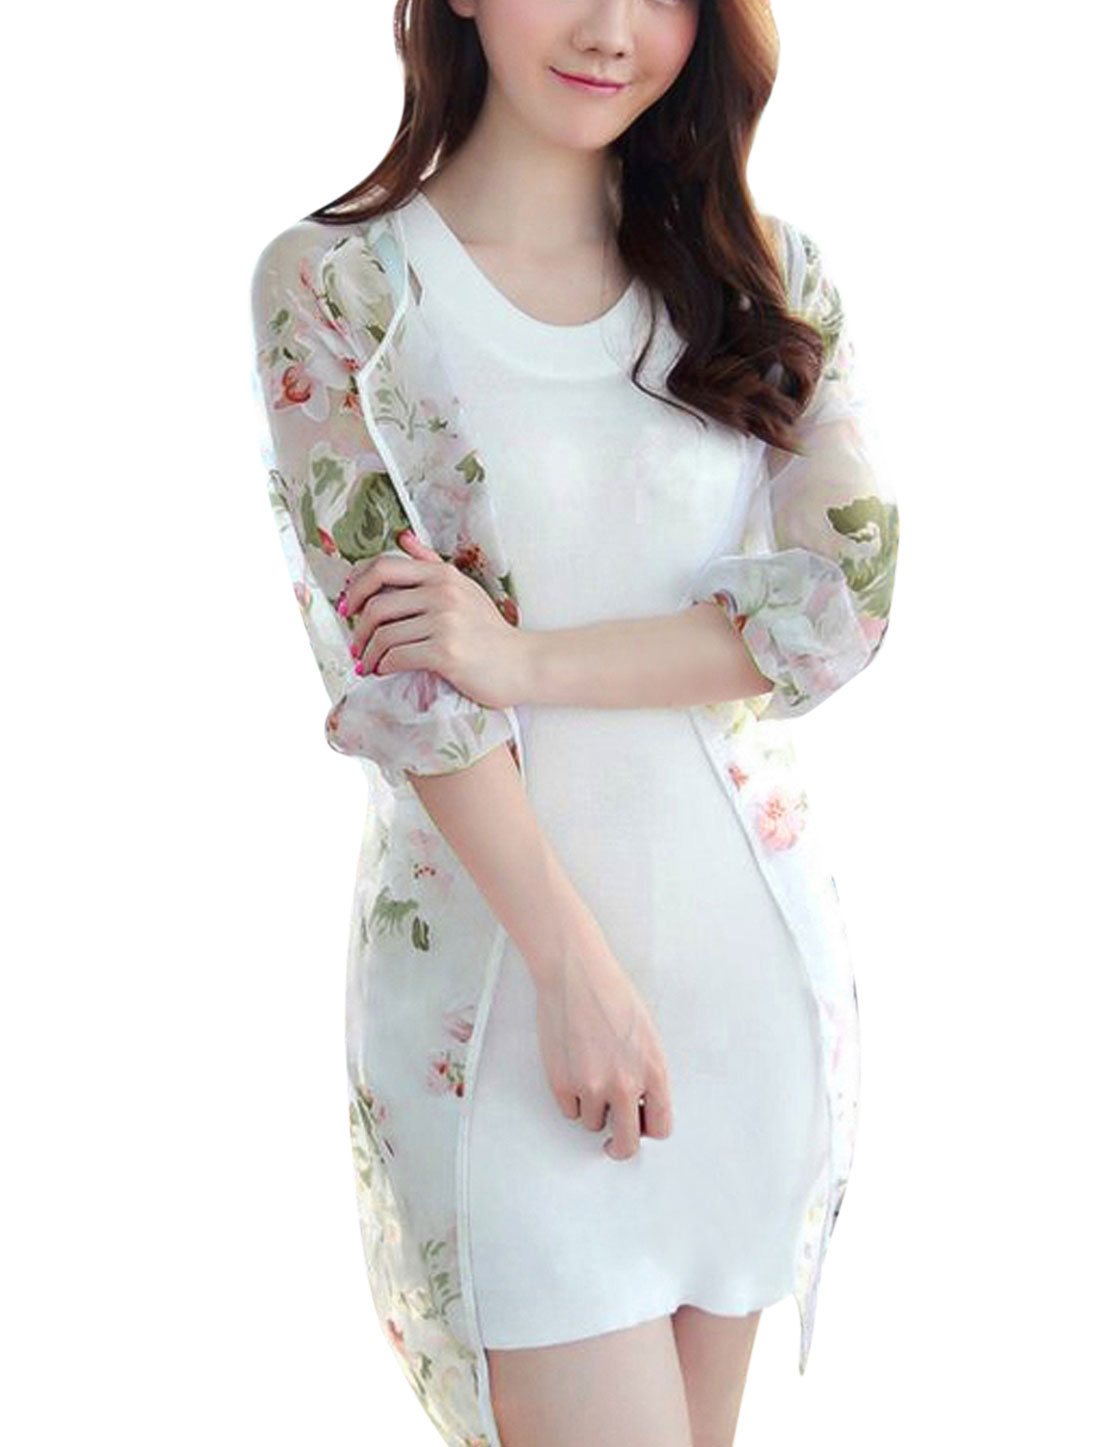 Ladies Front Opening Floral Print Semi Sheer Tunic Cardigan White XS